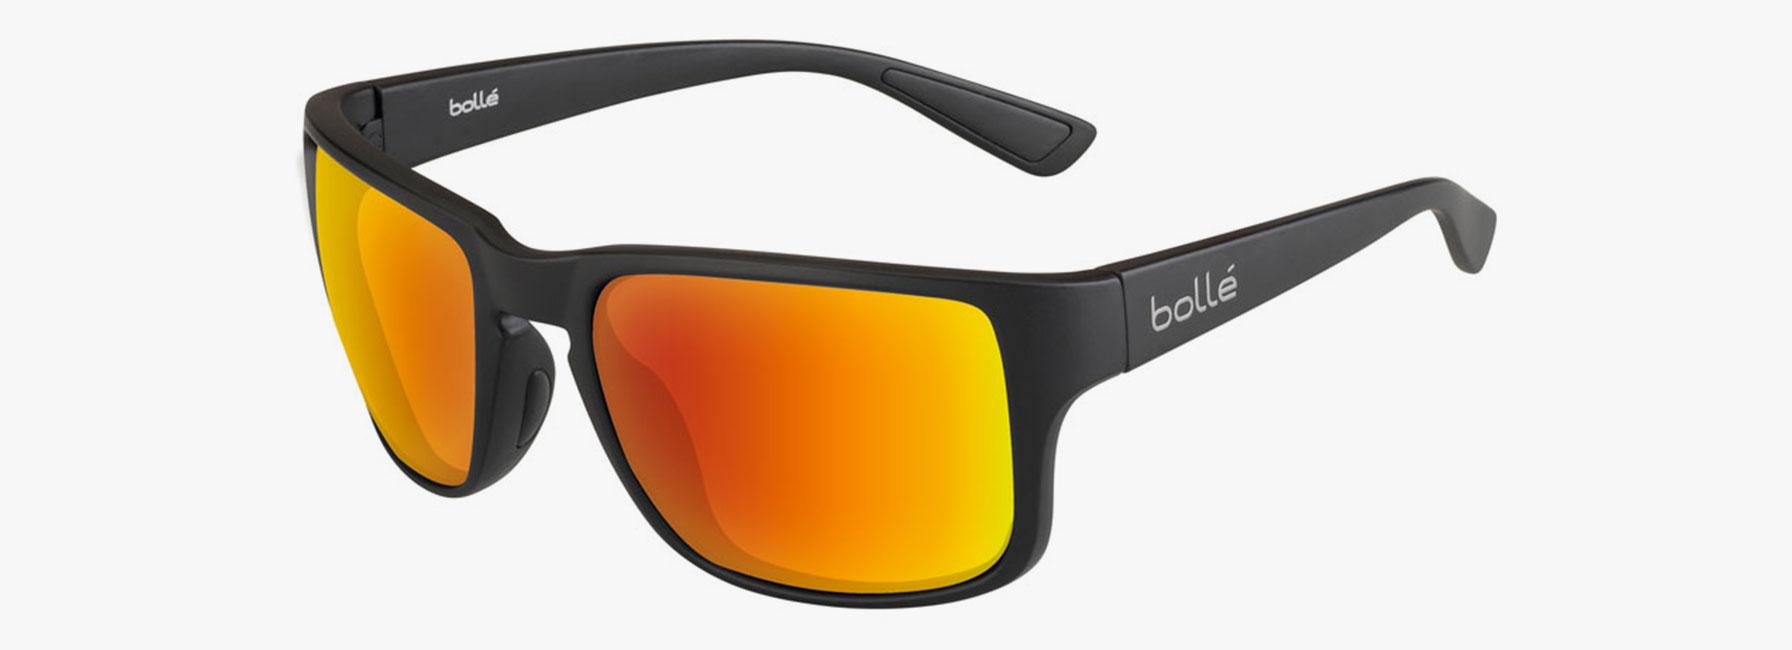 Bolle Slate Sunglasses